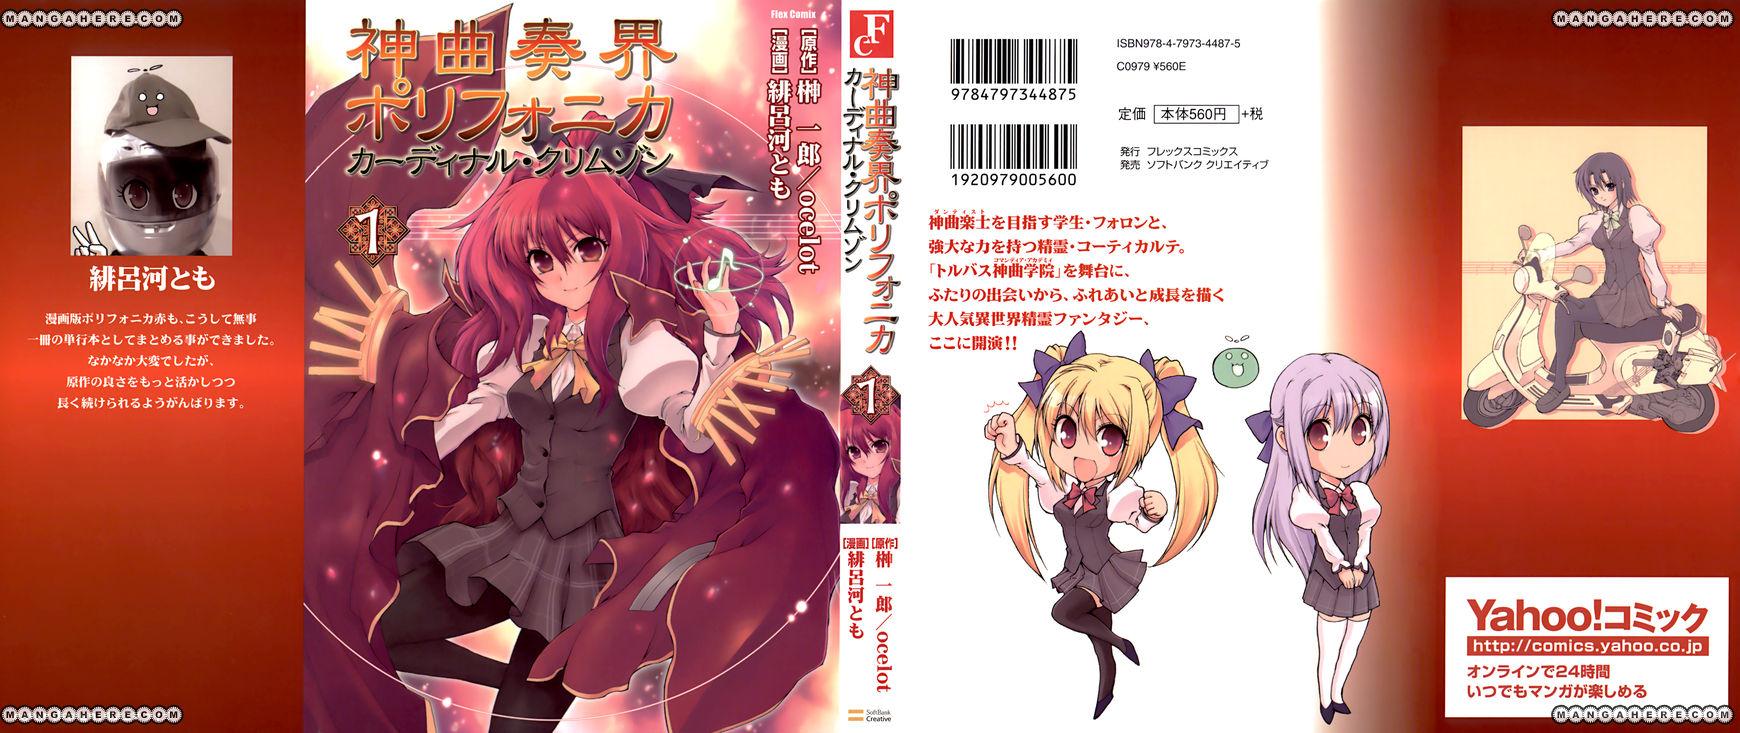 Shinkyoku Soukai Polyphonica - Cardinal Crimson 0 Page 1